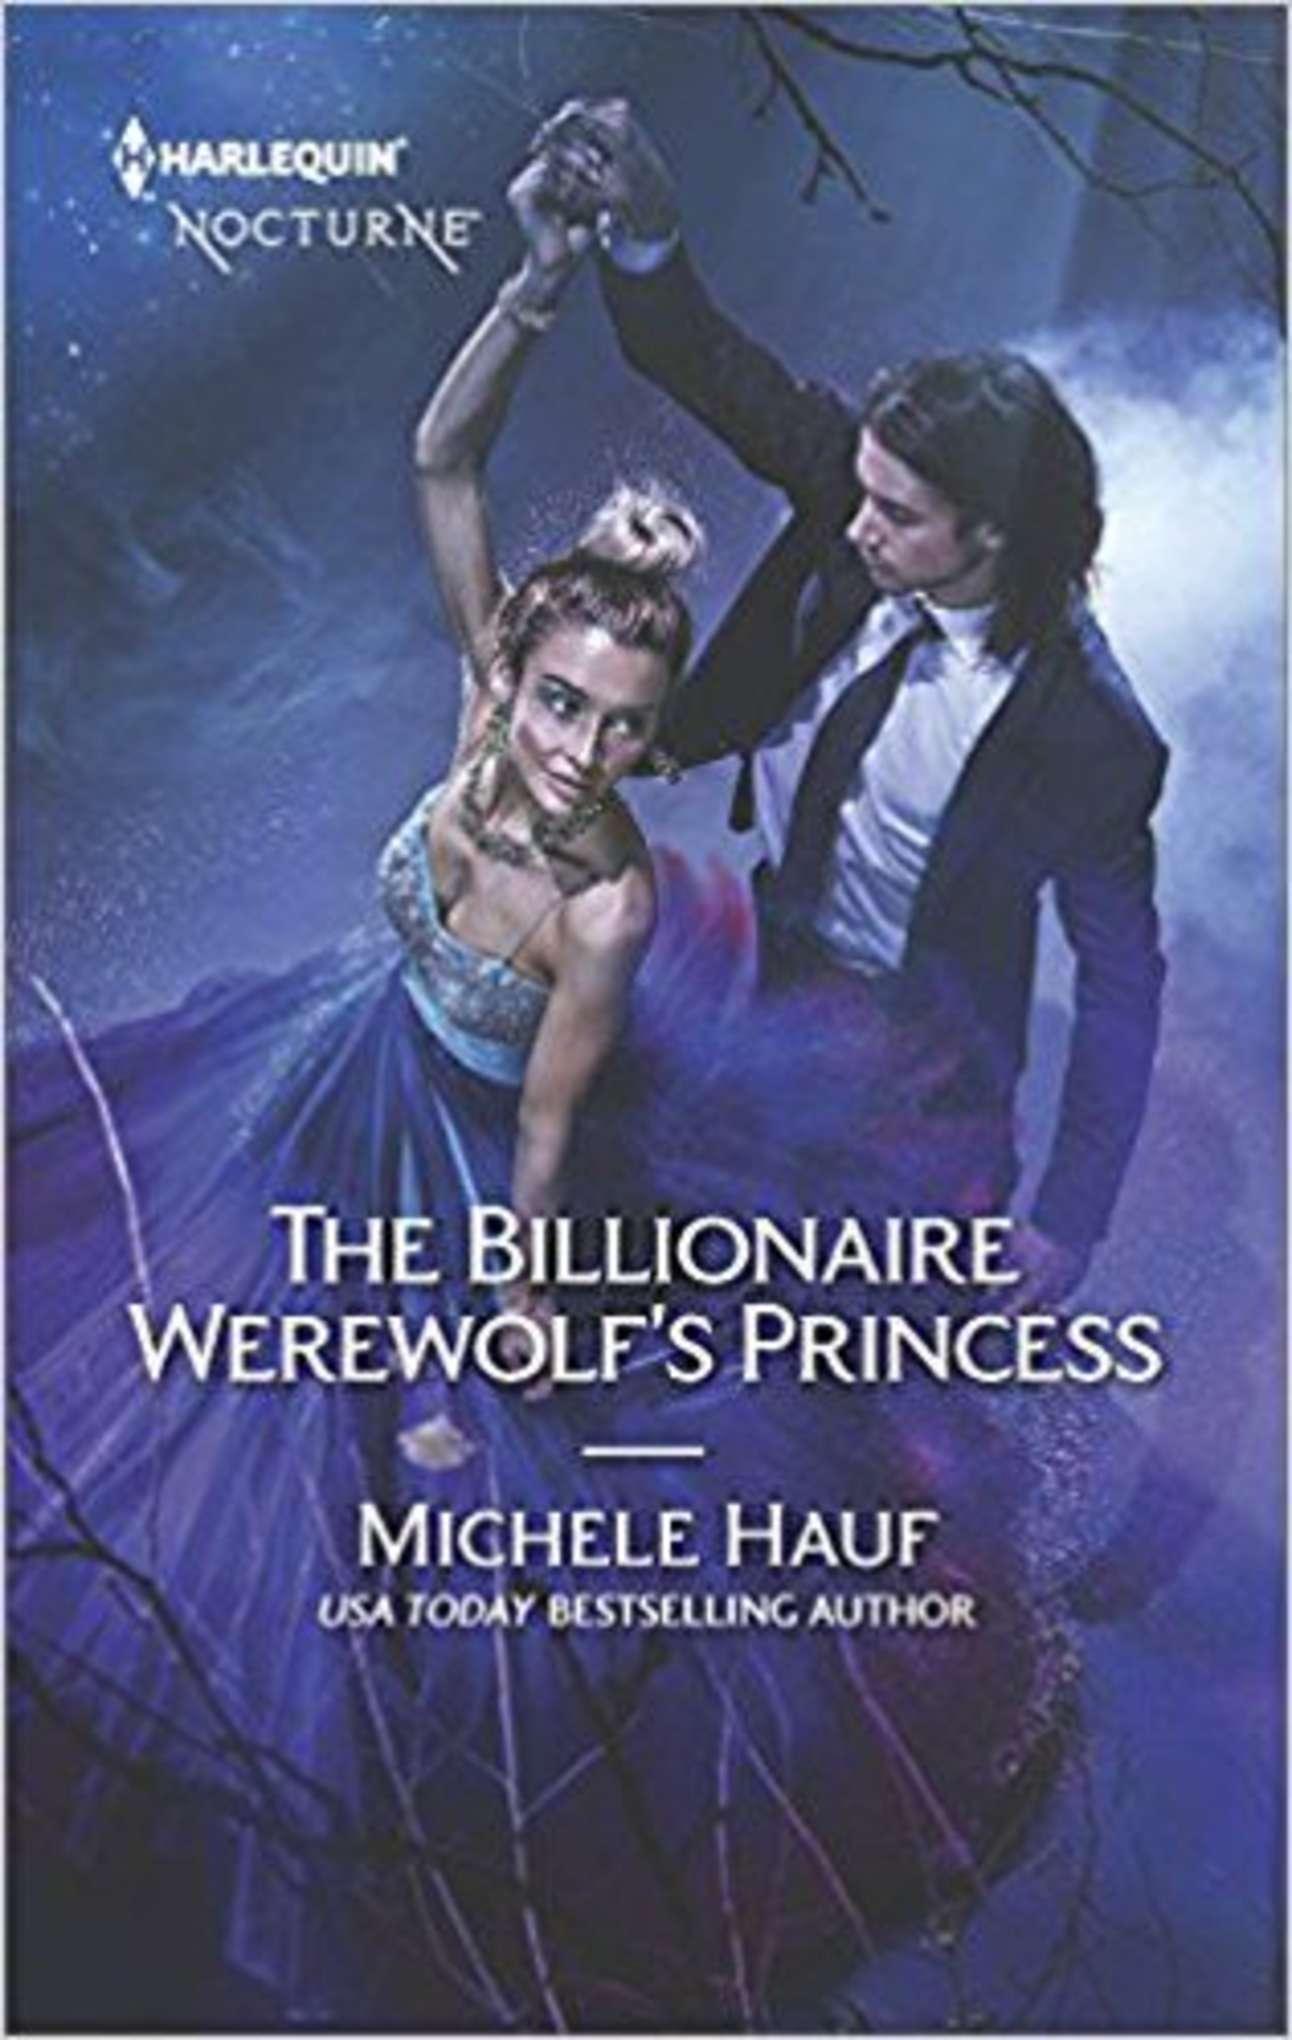 The Billionaire Werewolf's Princess